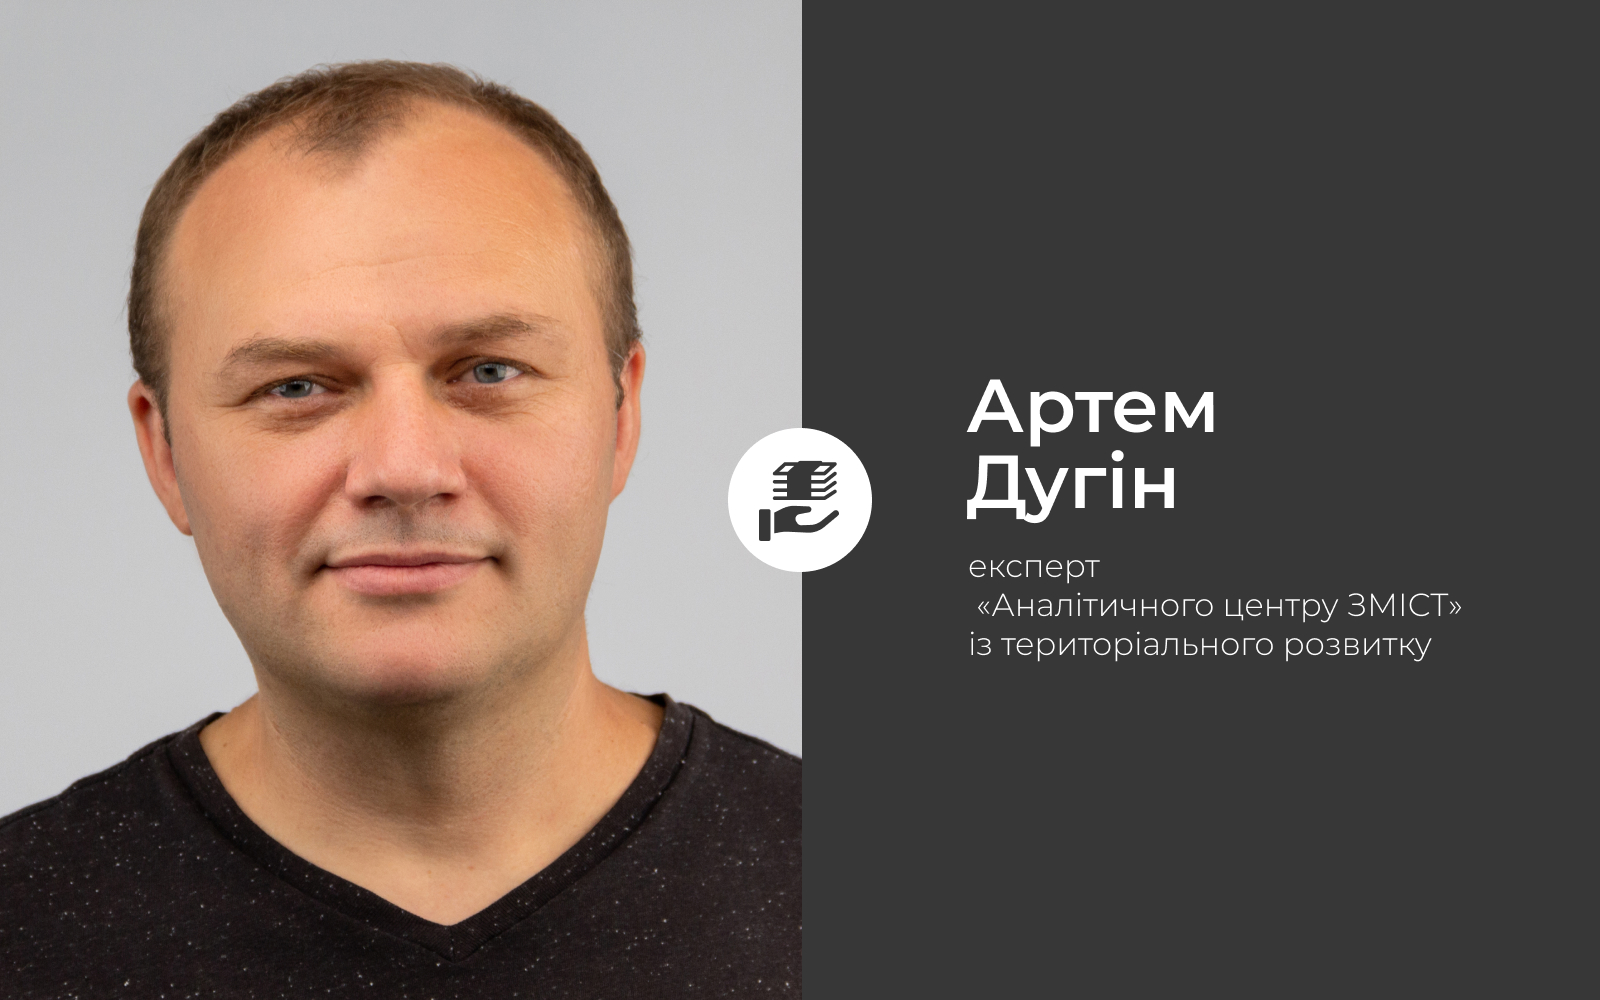 АЦ_блог_ФБ_Dugin 12.5.21 (2)